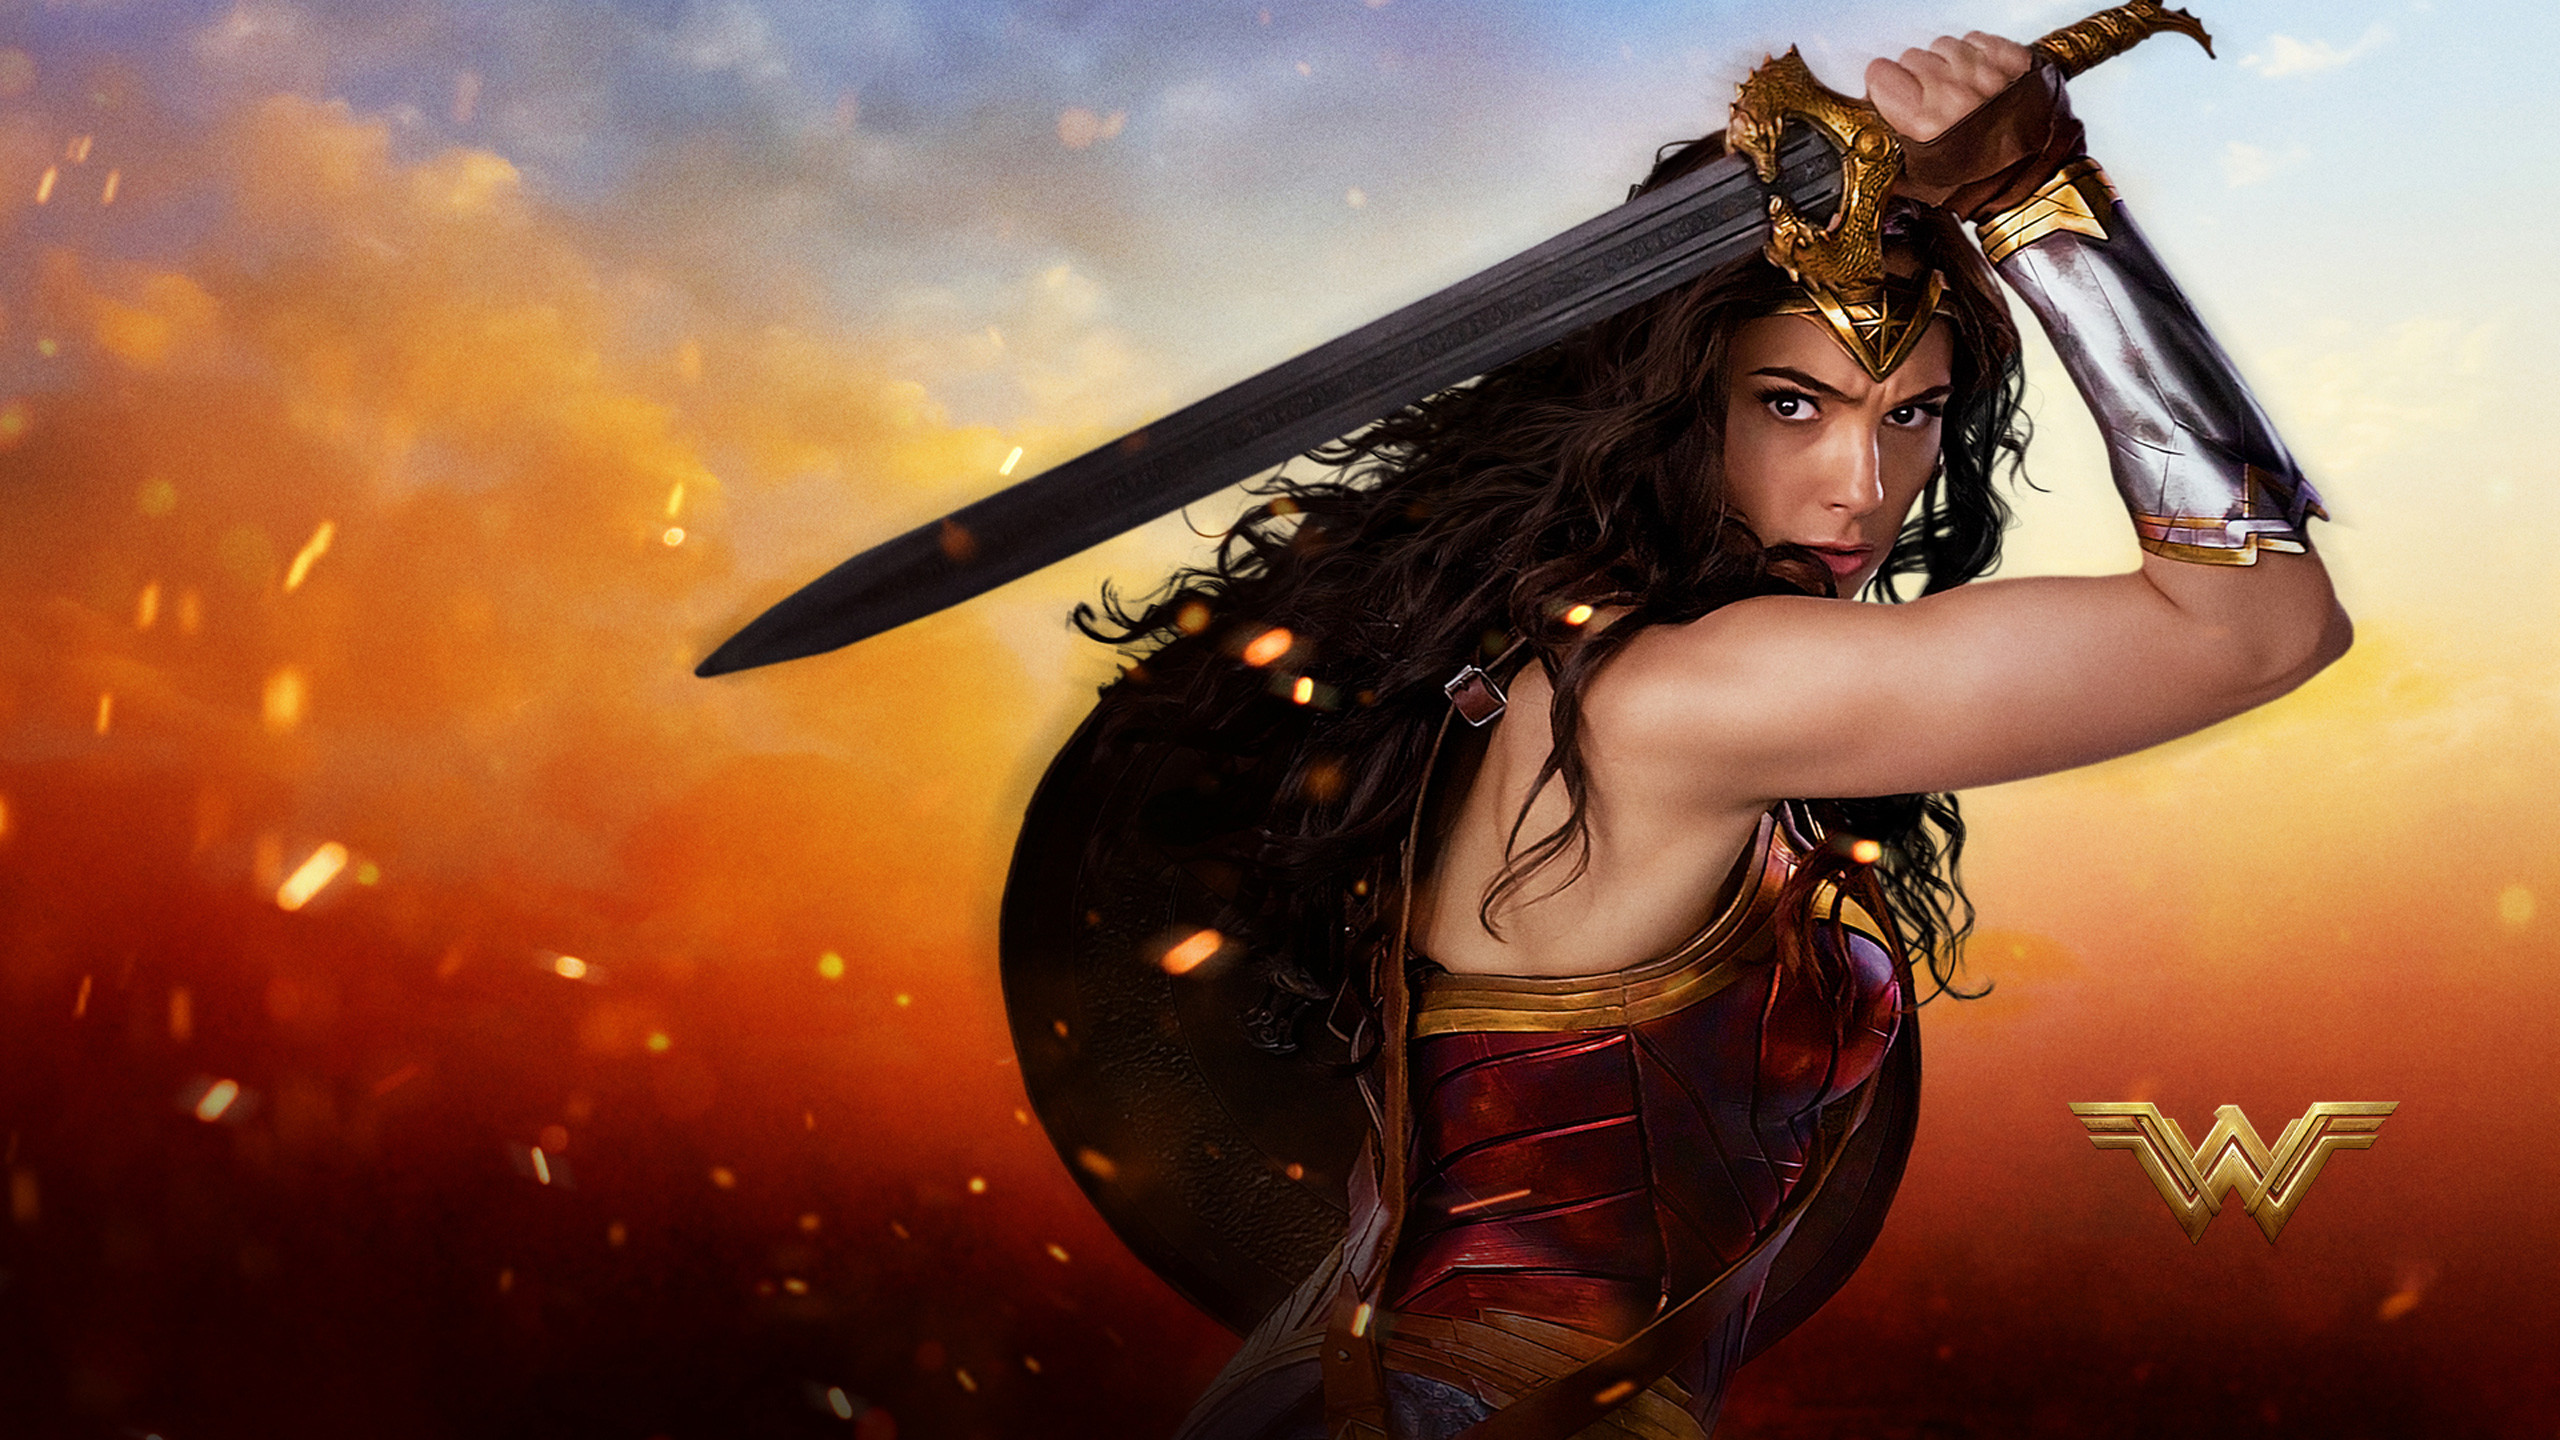 Wonder Woman wallpaper | Wonder Woman wallpapers hd | Pinterest | Wonder  Woman and Wallpaper